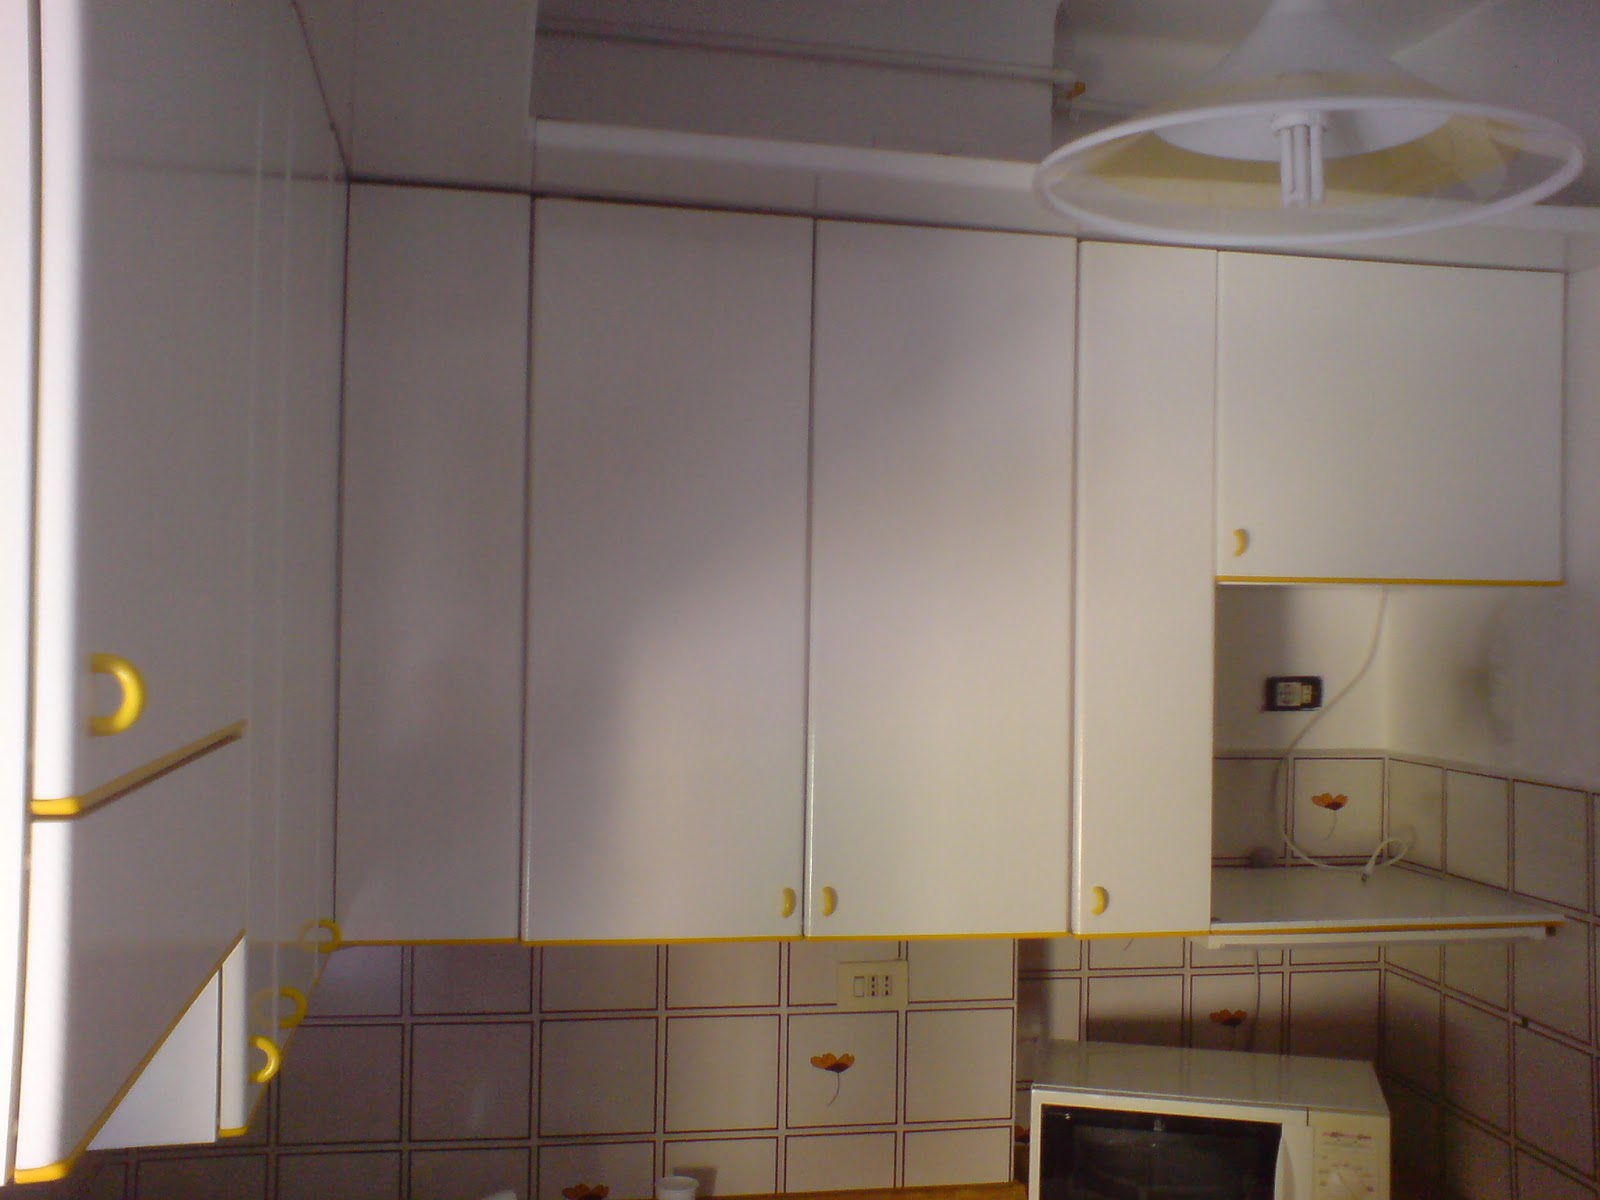 Cucina Ad Angolo Usata Roma   Cucina Gas Usata Roma Cucine Lofra ...